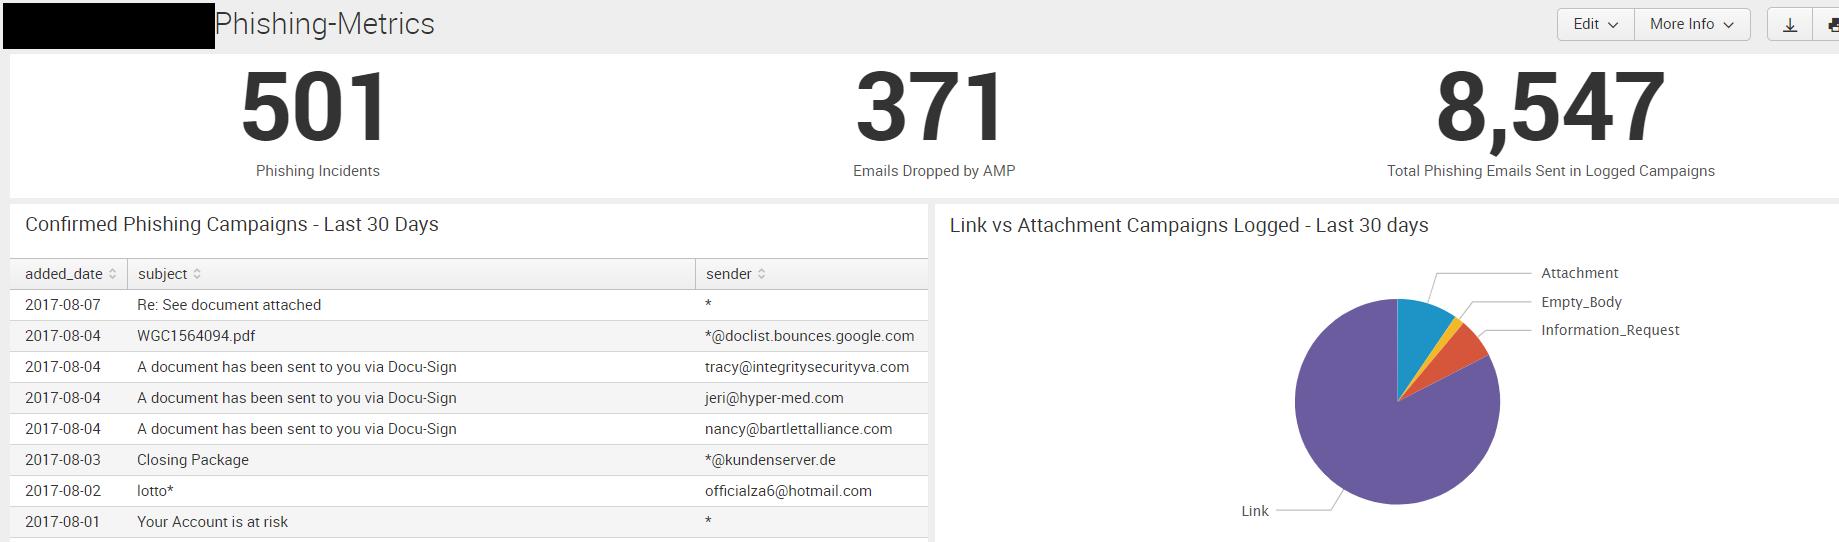 Phishing_Metrics_Dashboard